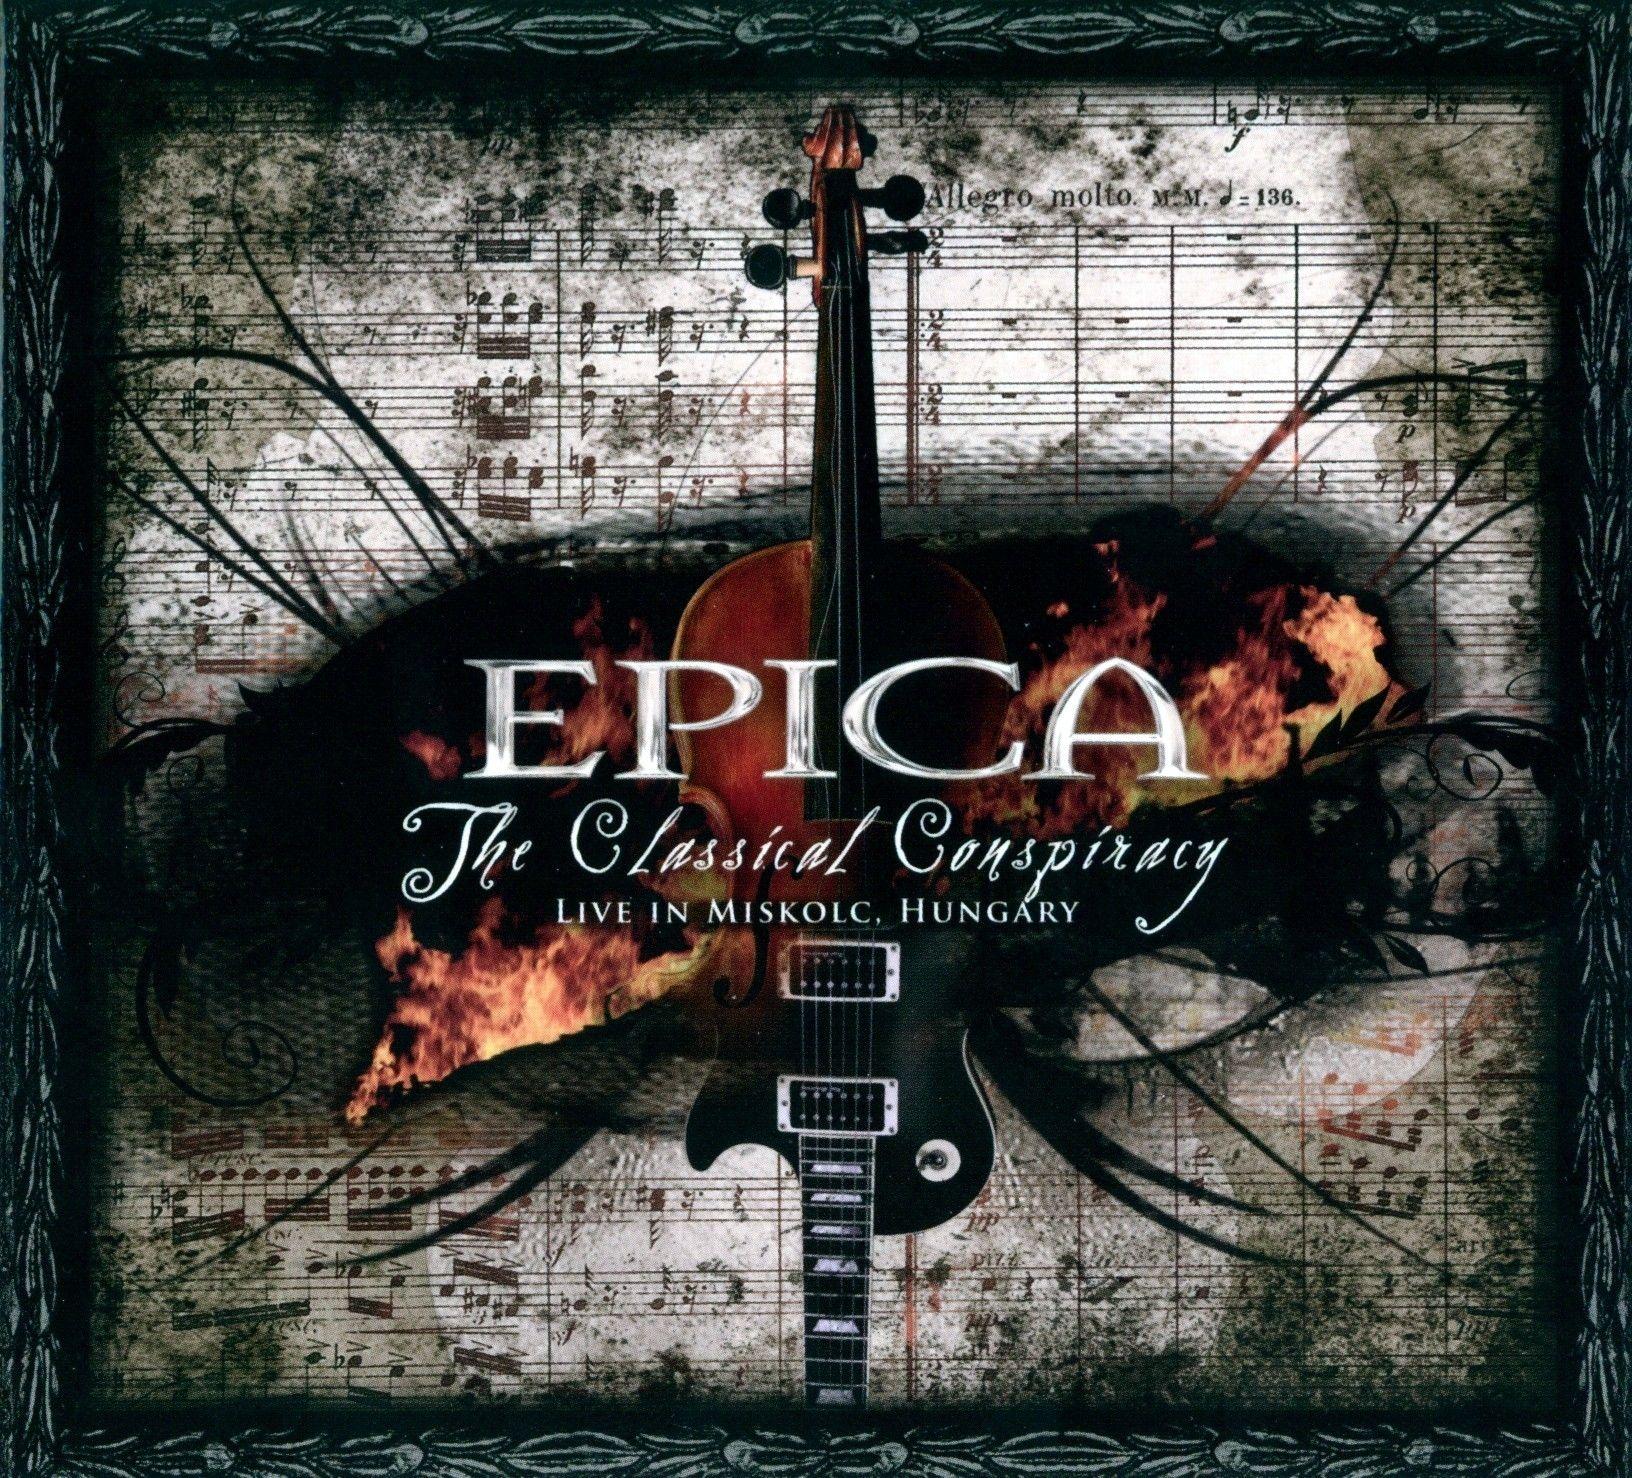 Epica - The Classical Conspiracy album cover